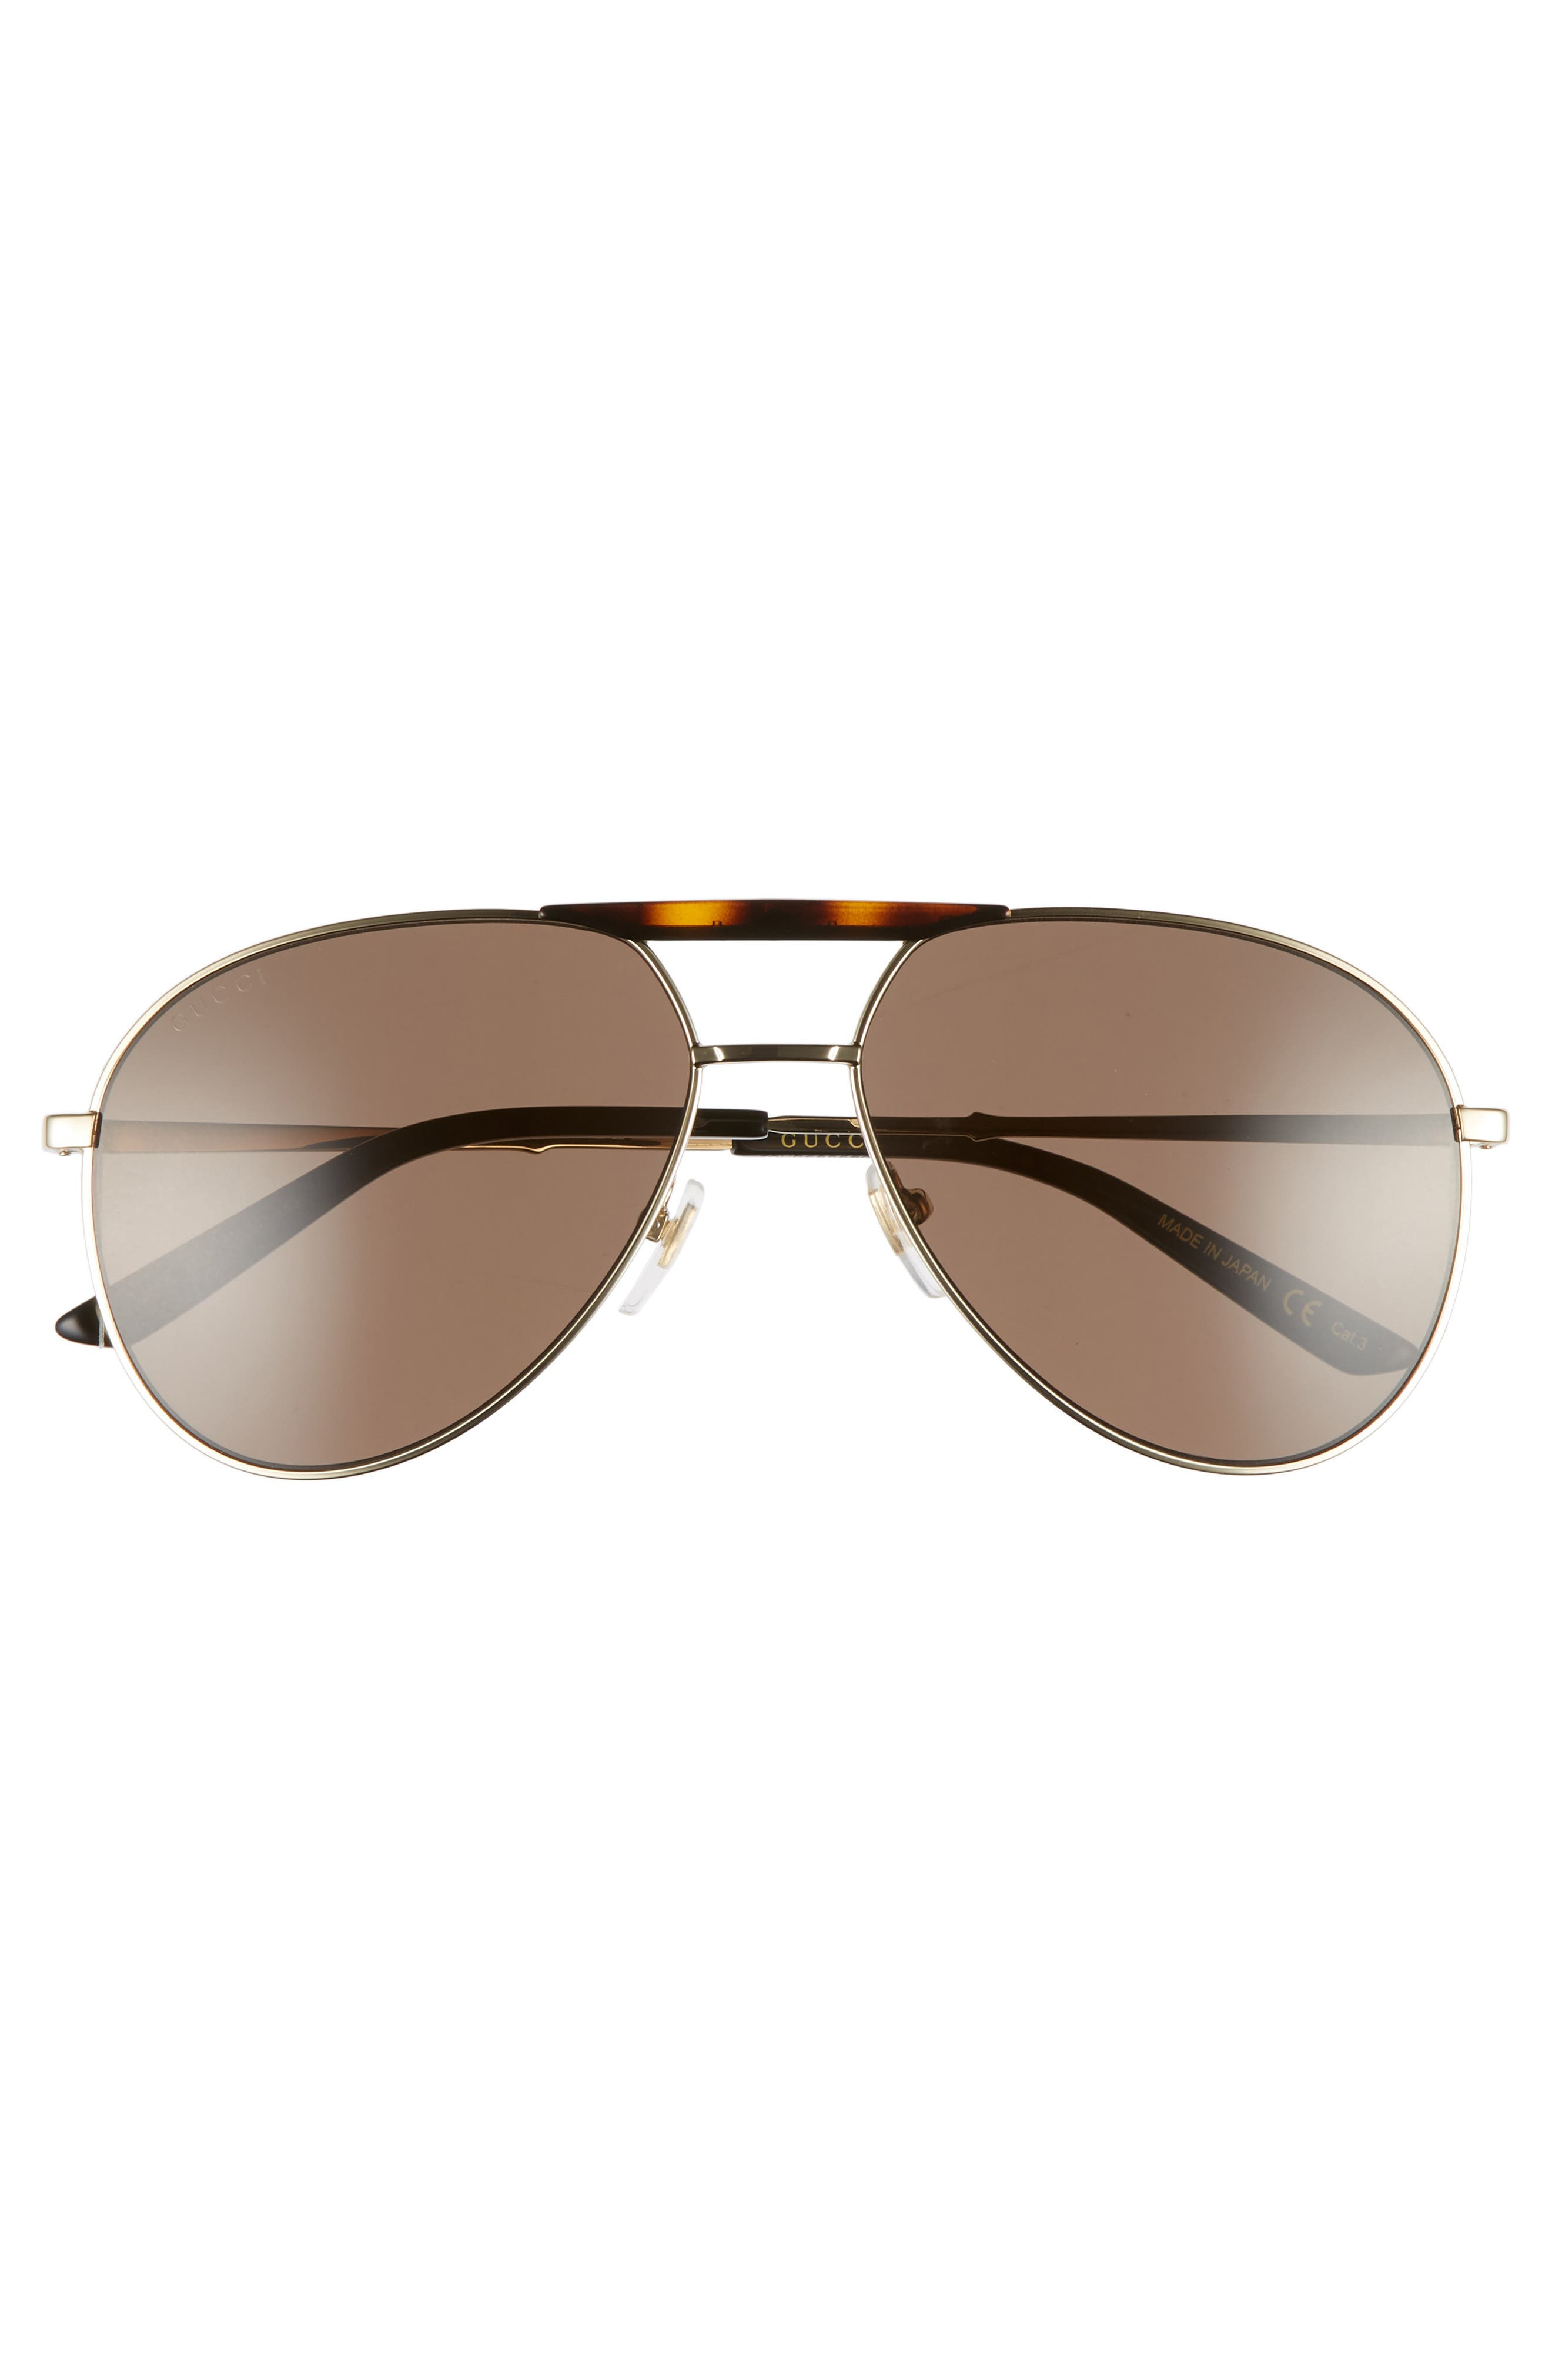 Cruise 59mm Aviator Sunglasses,                             Alternate thumbnail 2, color,                             GOLD/ BLACK